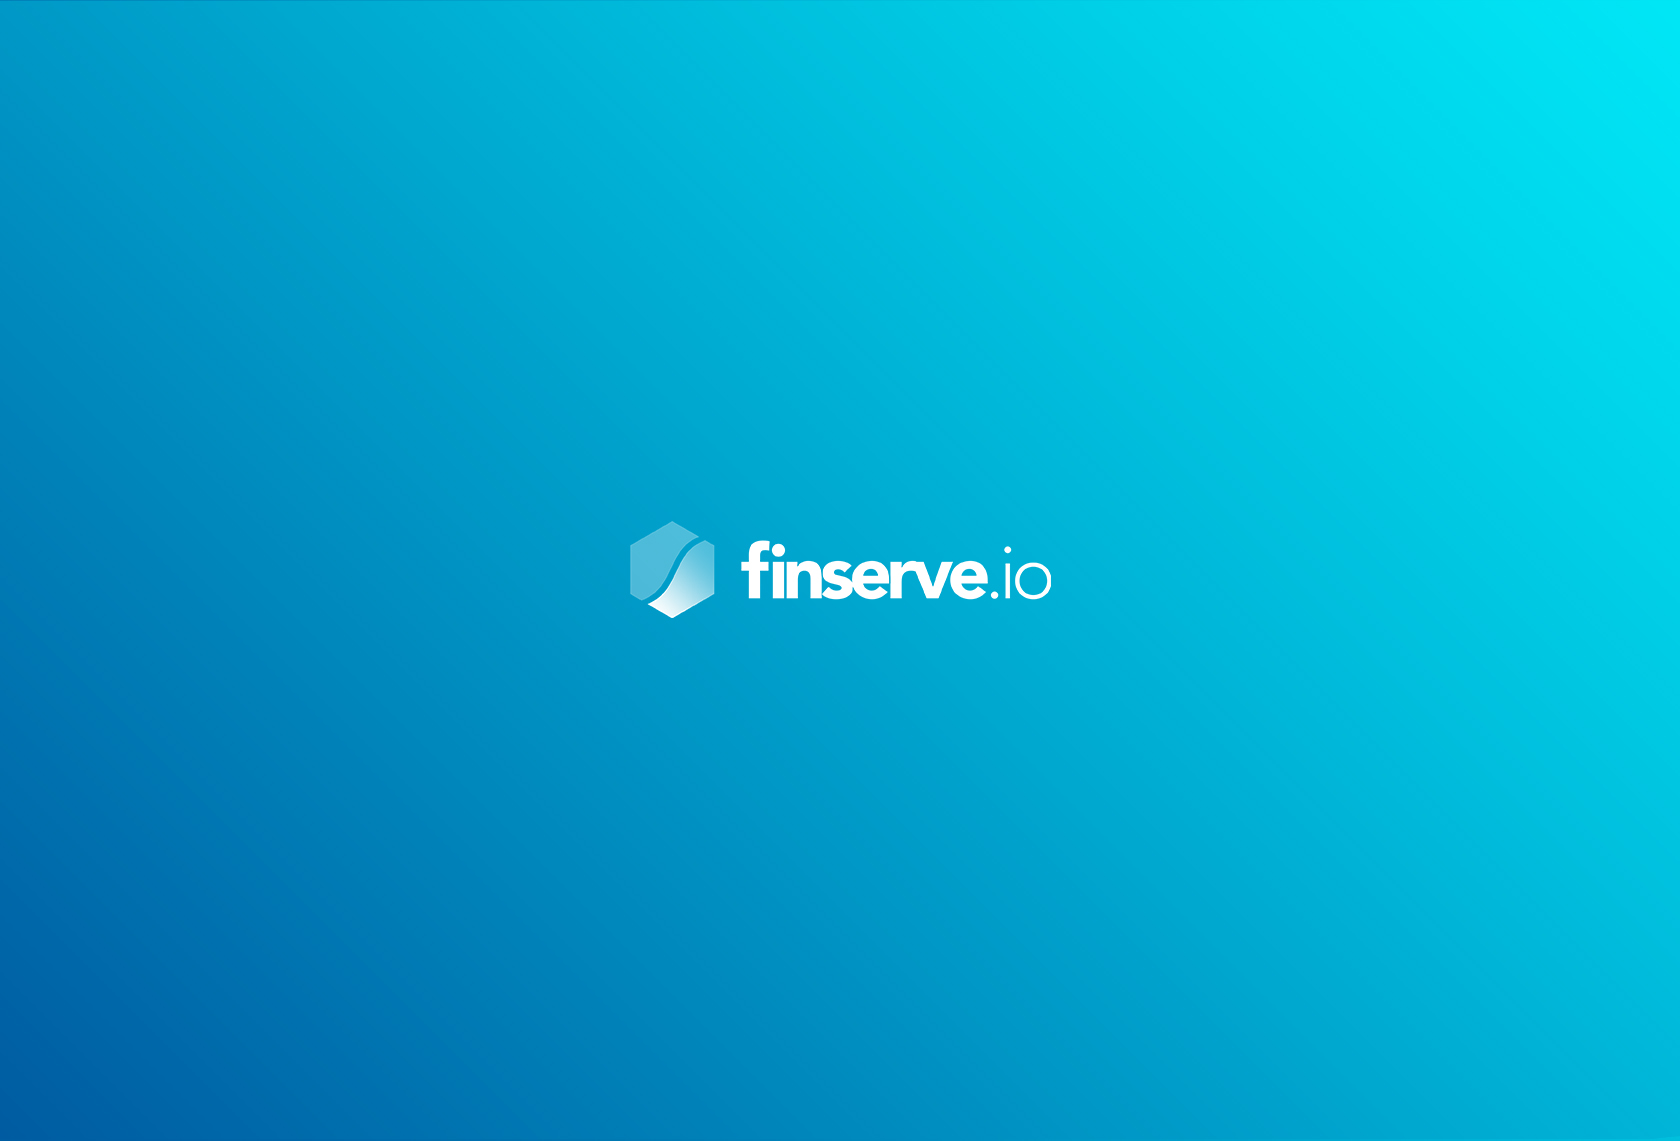 Finserve Watermark - Finserve.io (Branding) - Creative Digital